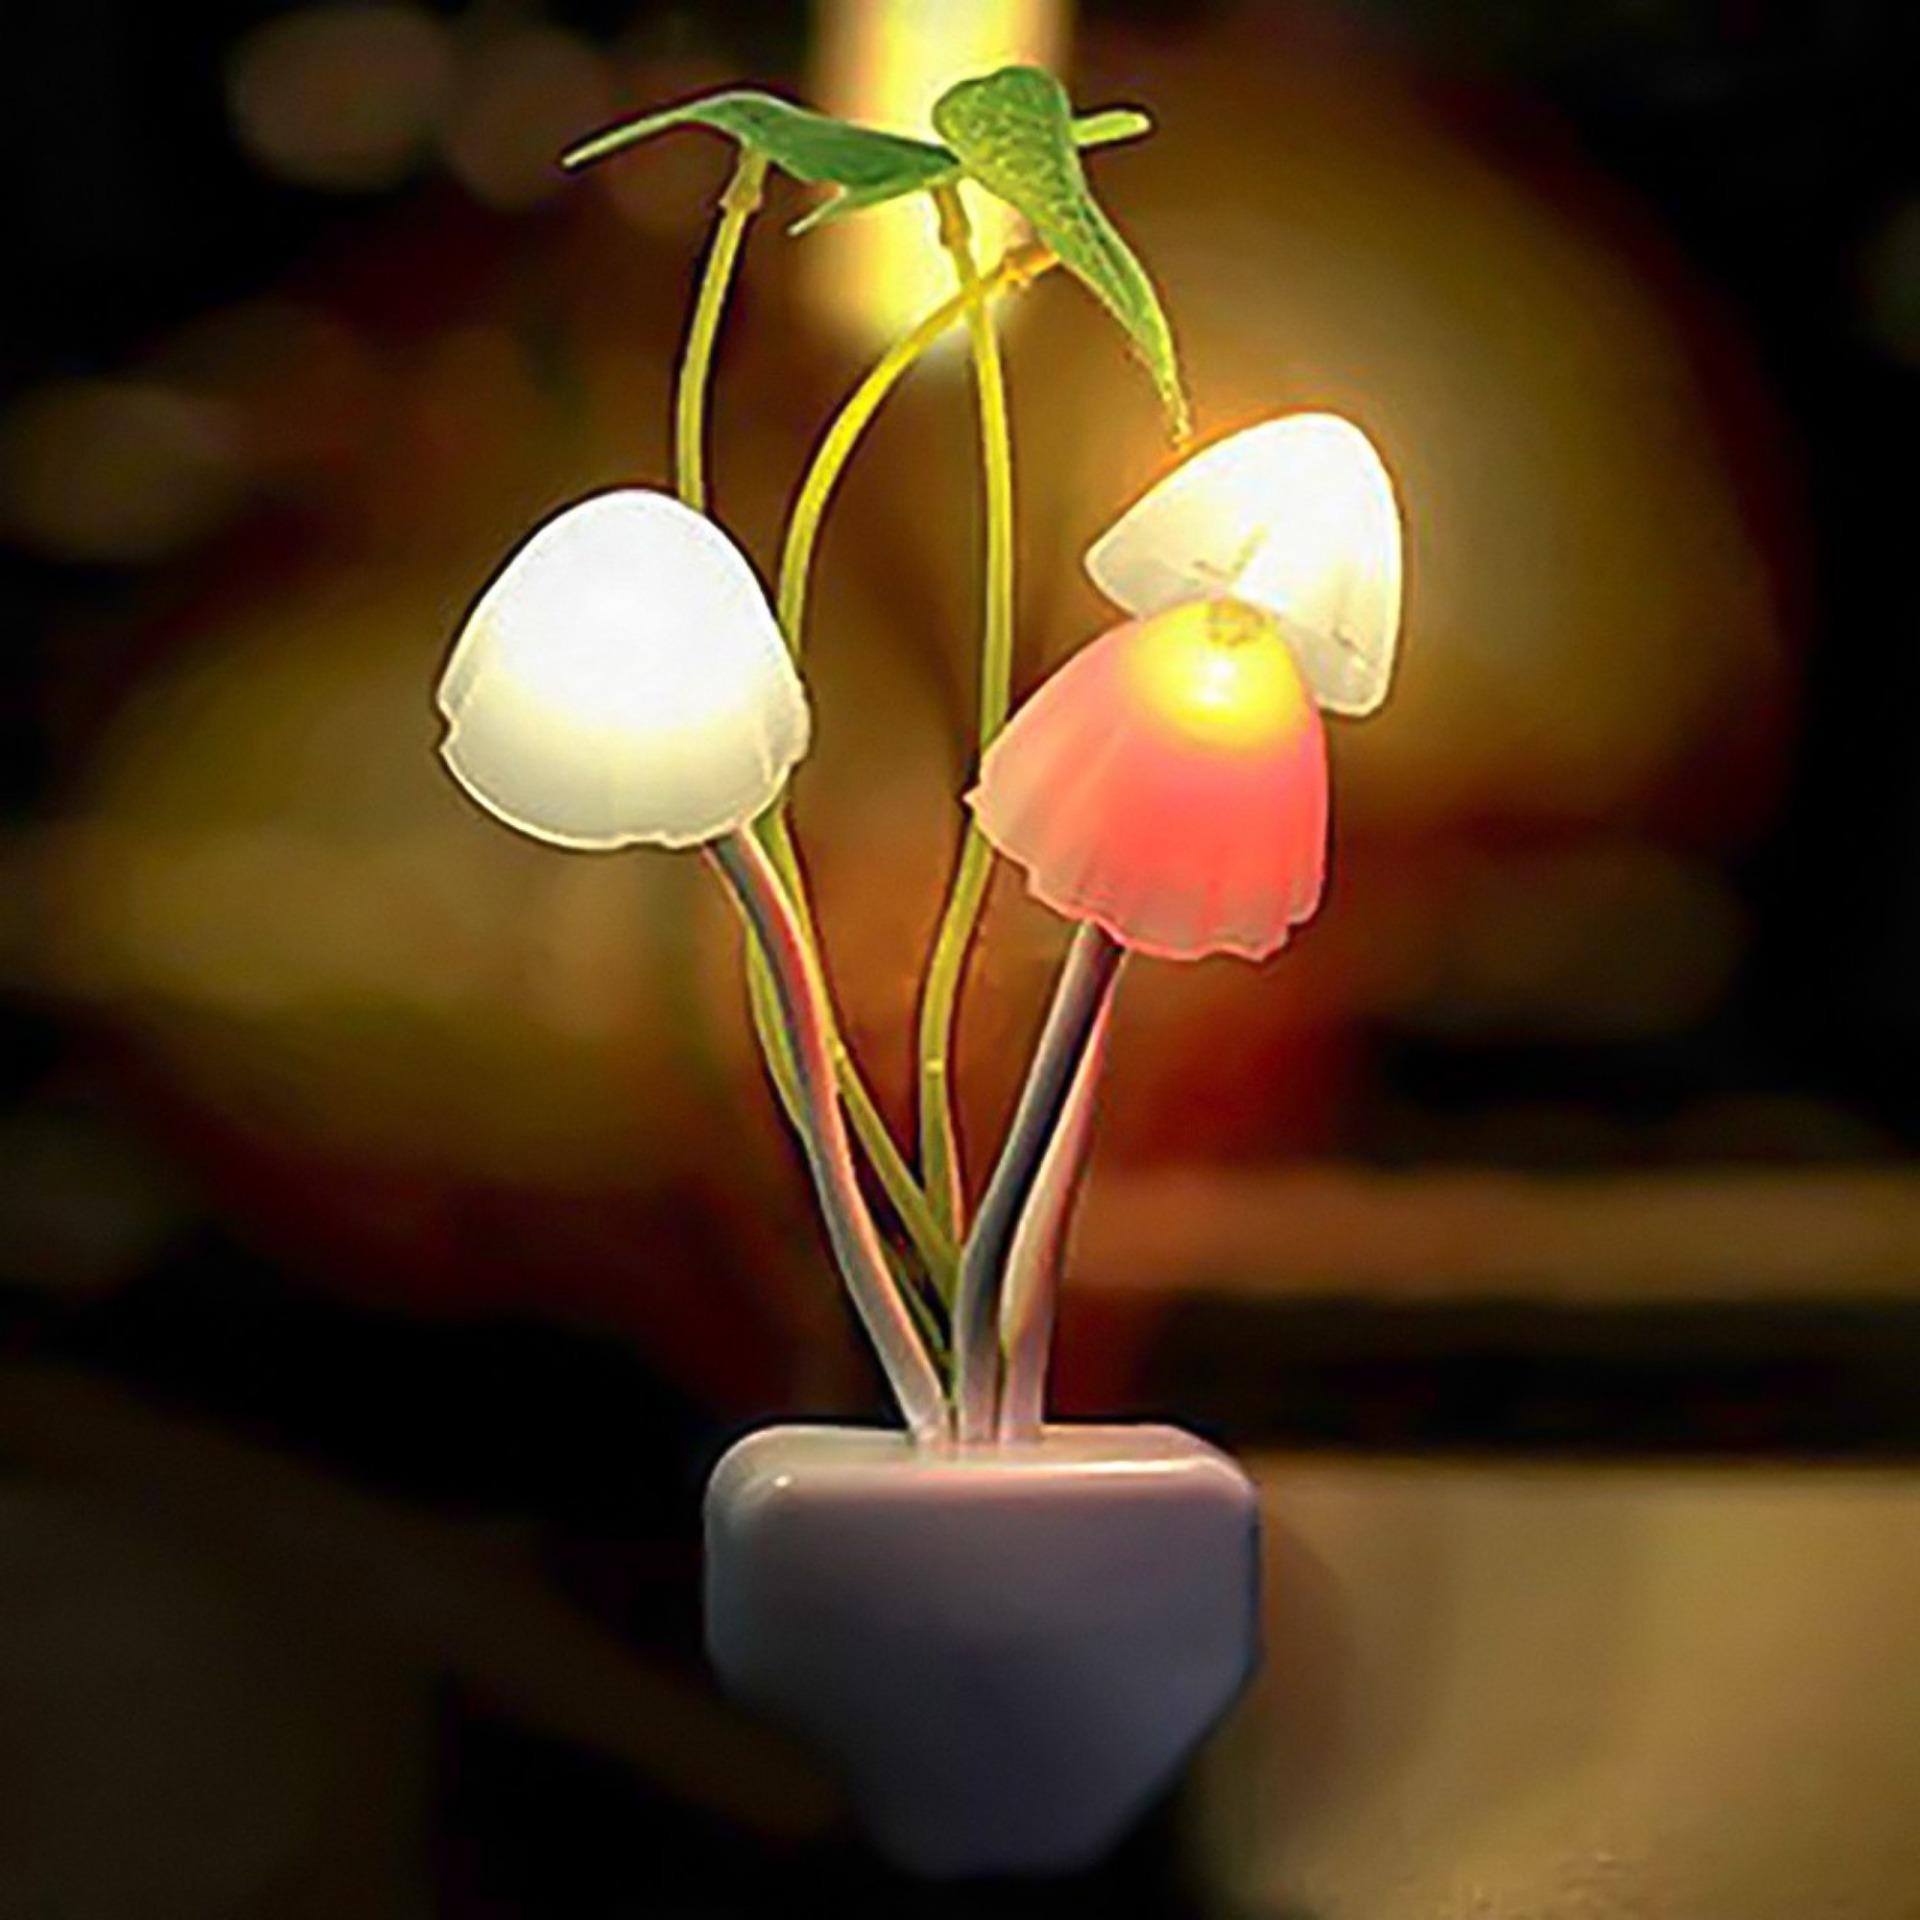 Lampu Tidur LED Lampu Jamur Lampu